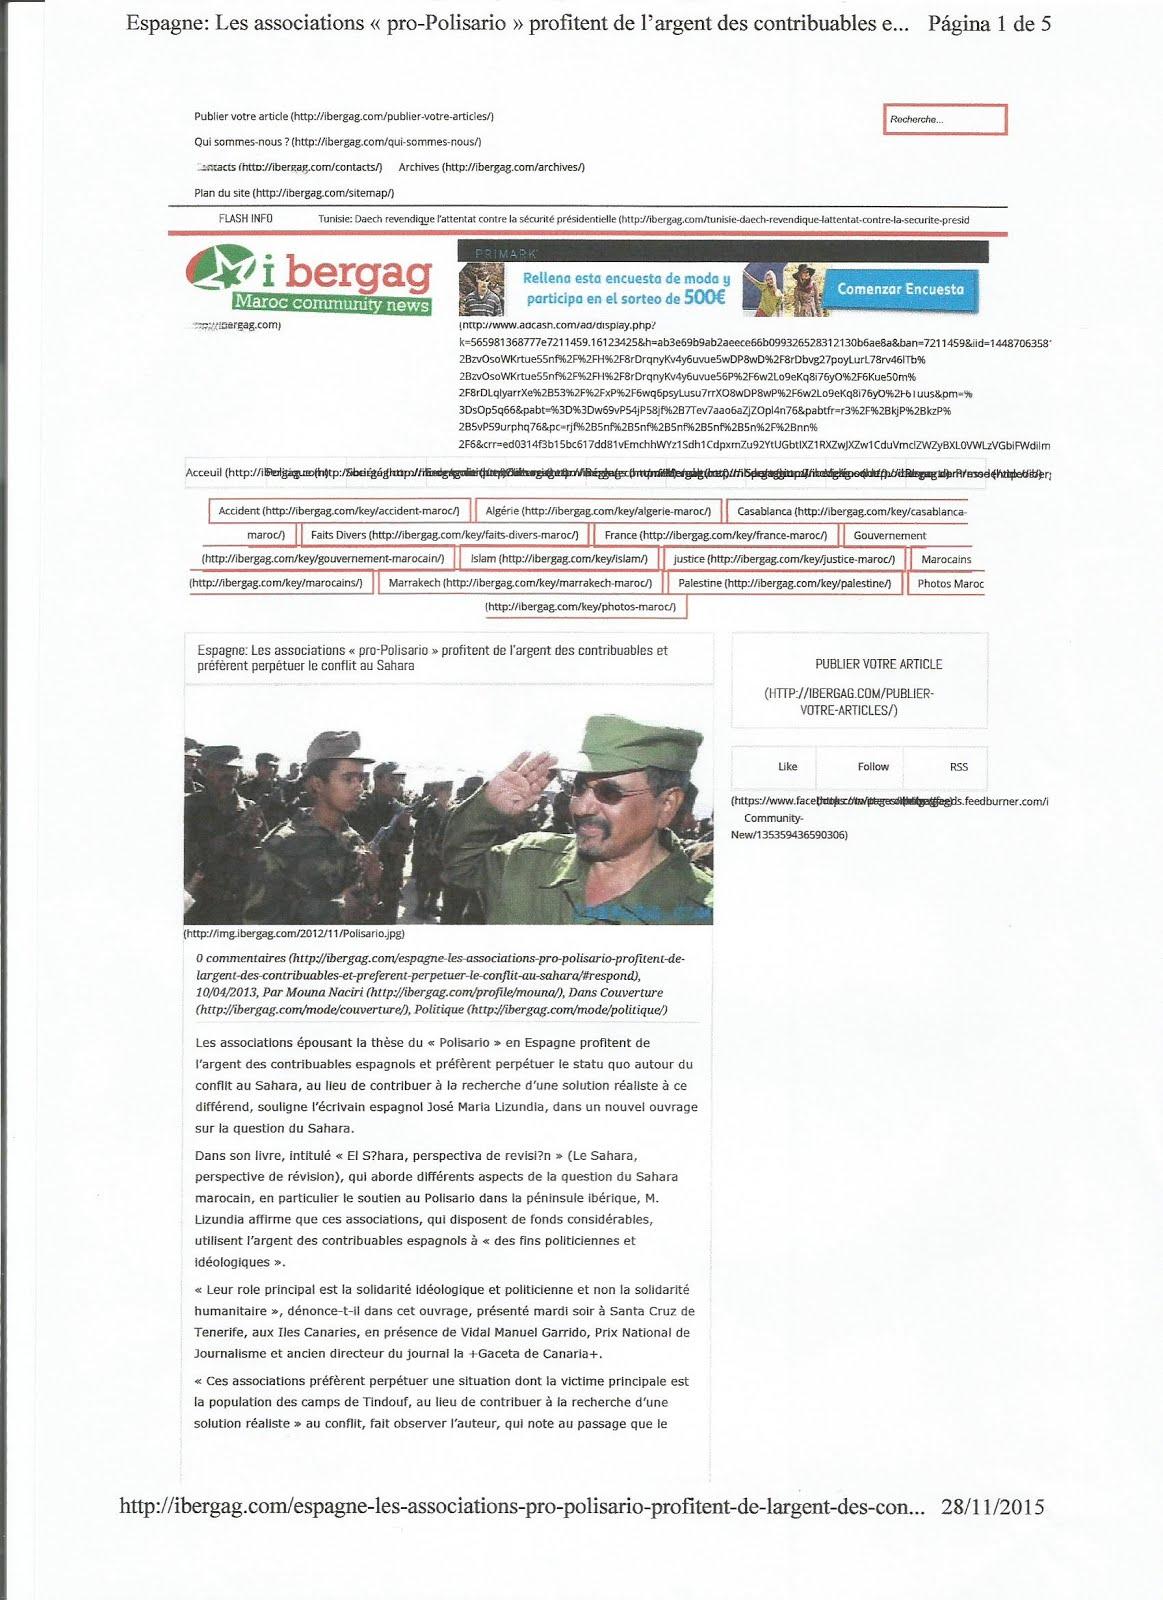 IBERGAG MAROC COMMUNITY NEWS